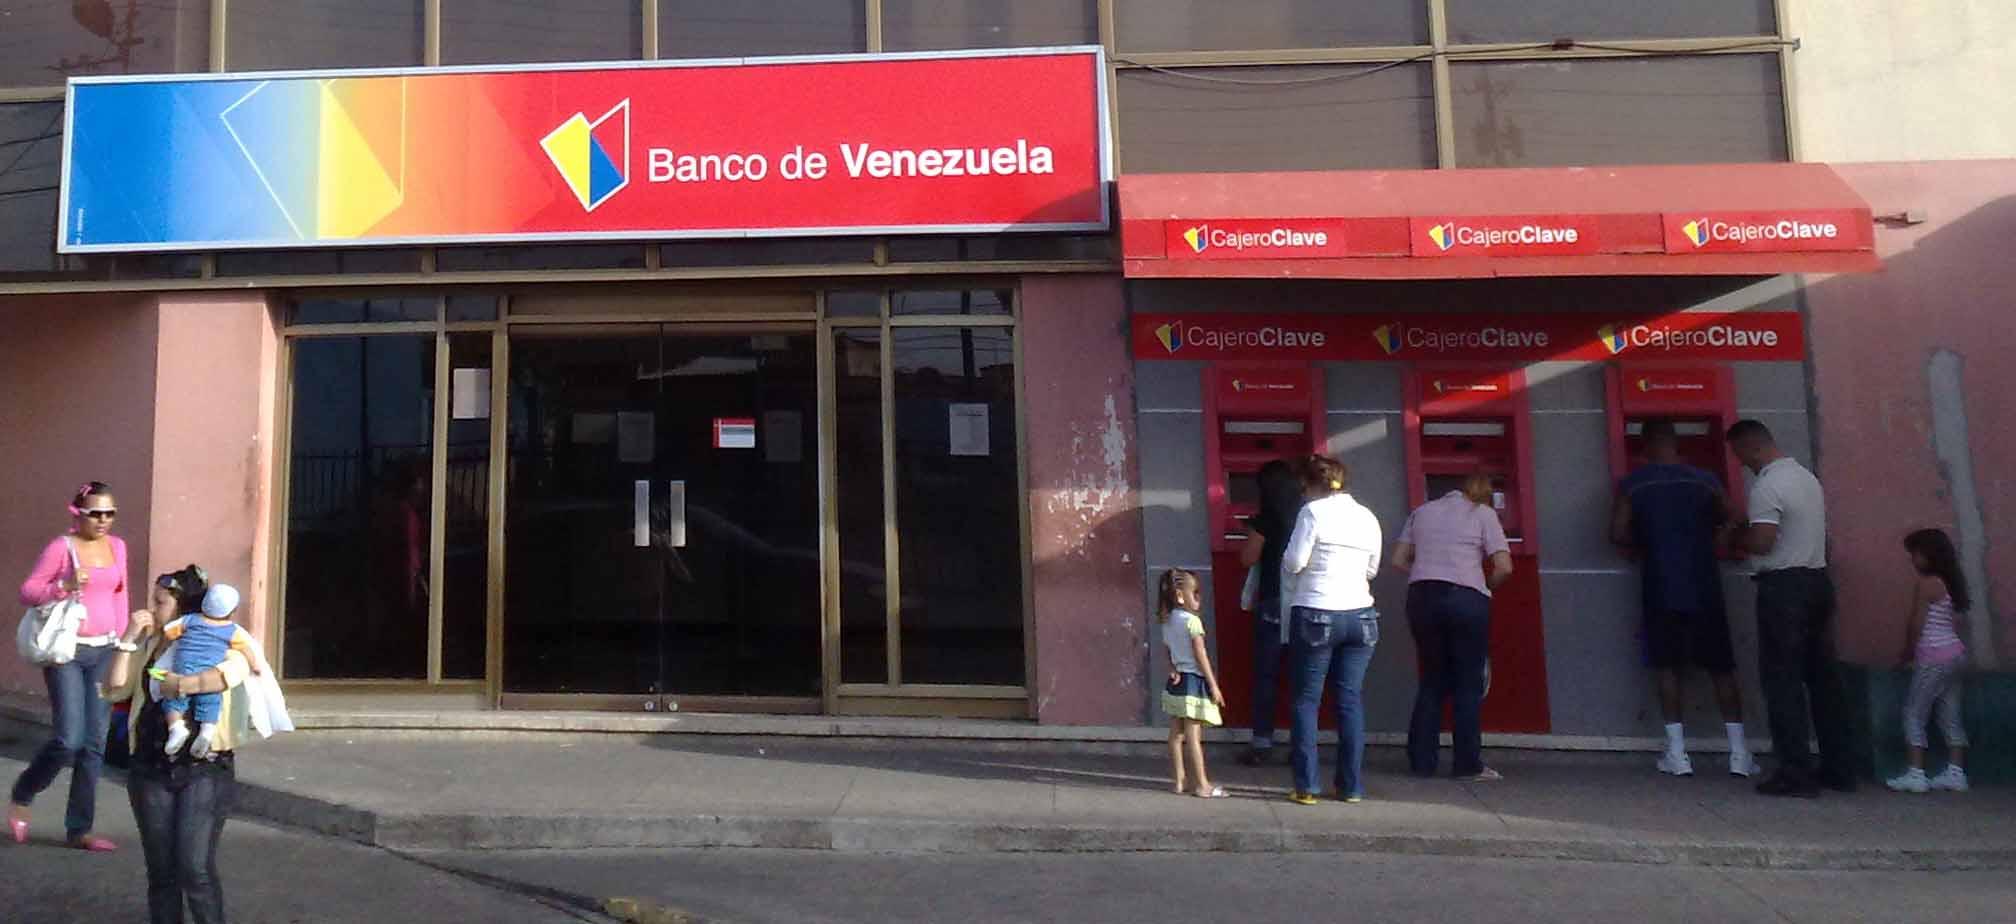 Archivo fachada banco de wikipedia la for Banco venezuela online